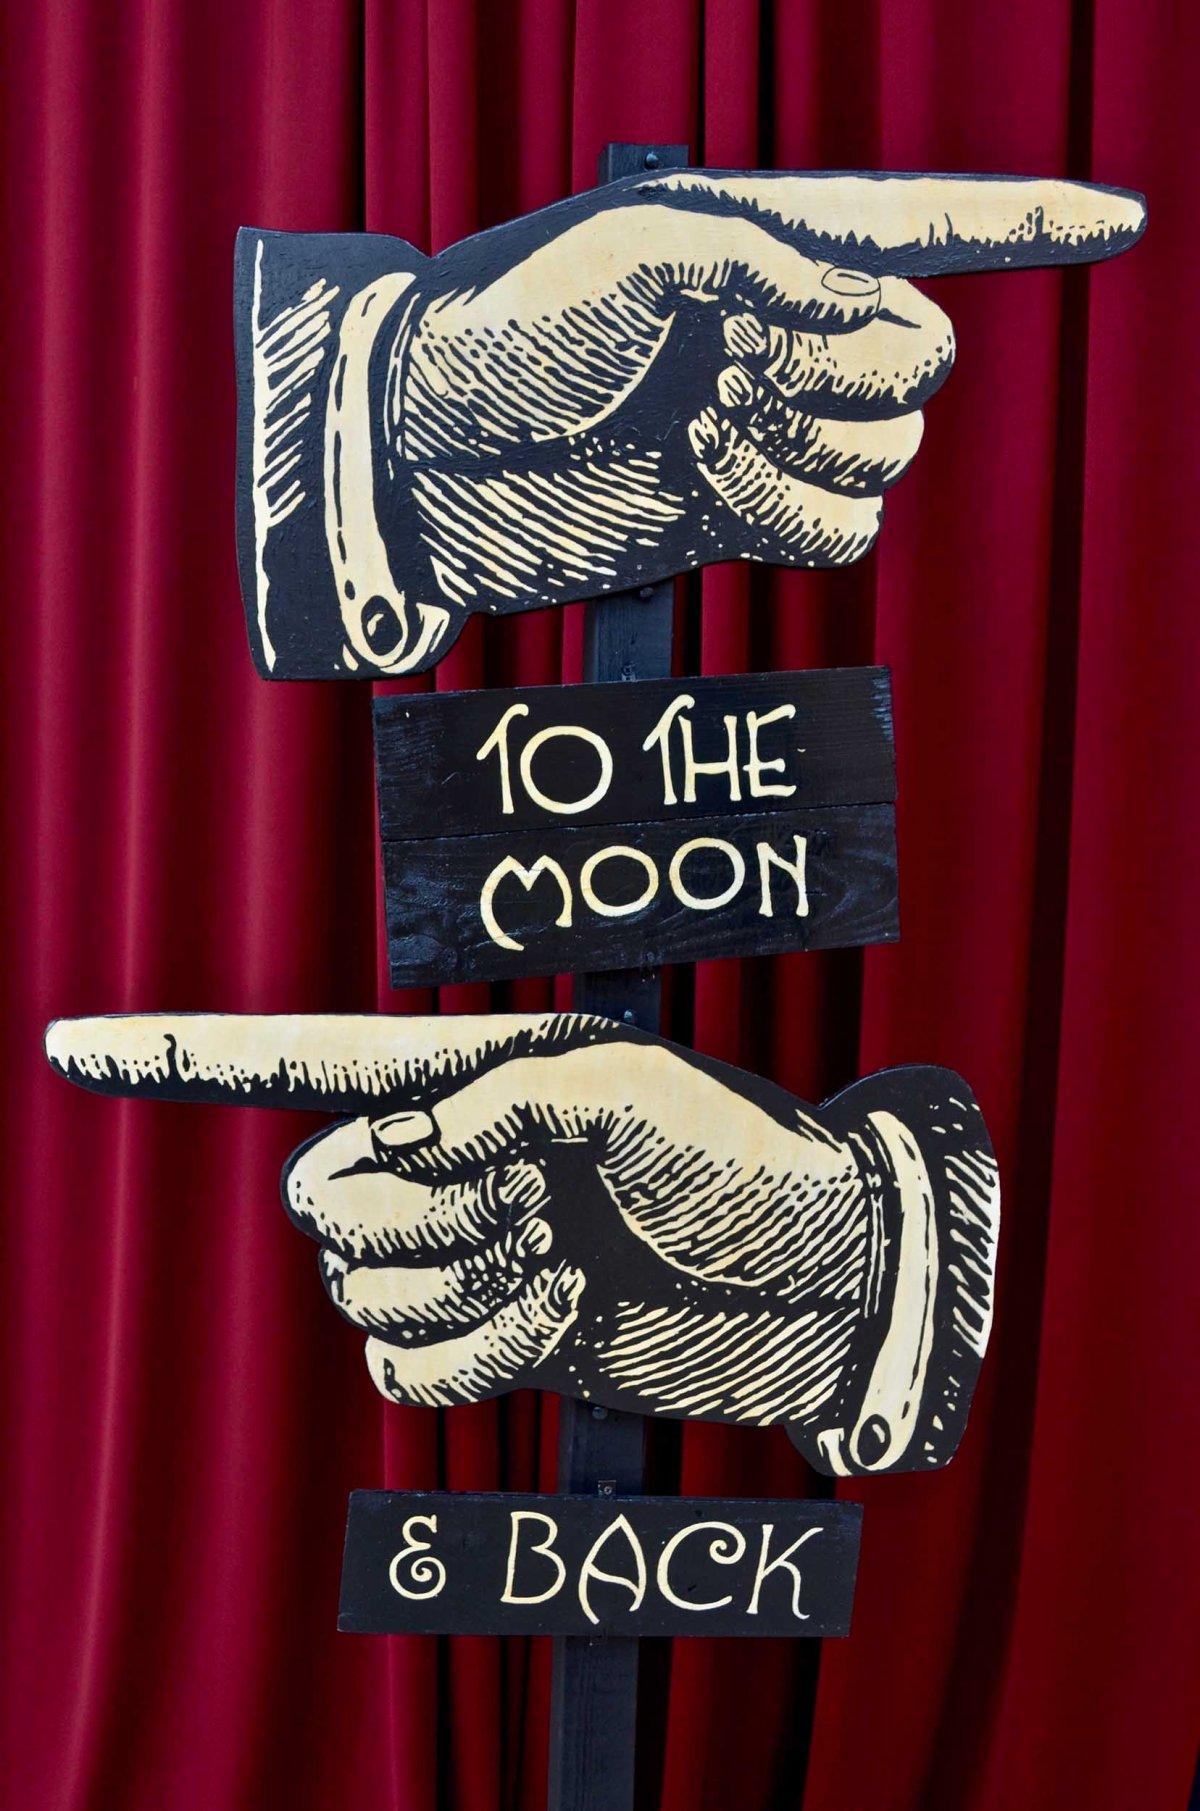 Papermoon-photo-prop-cresent-moon-sculpture-rachel-kiernan-irish-art-sign